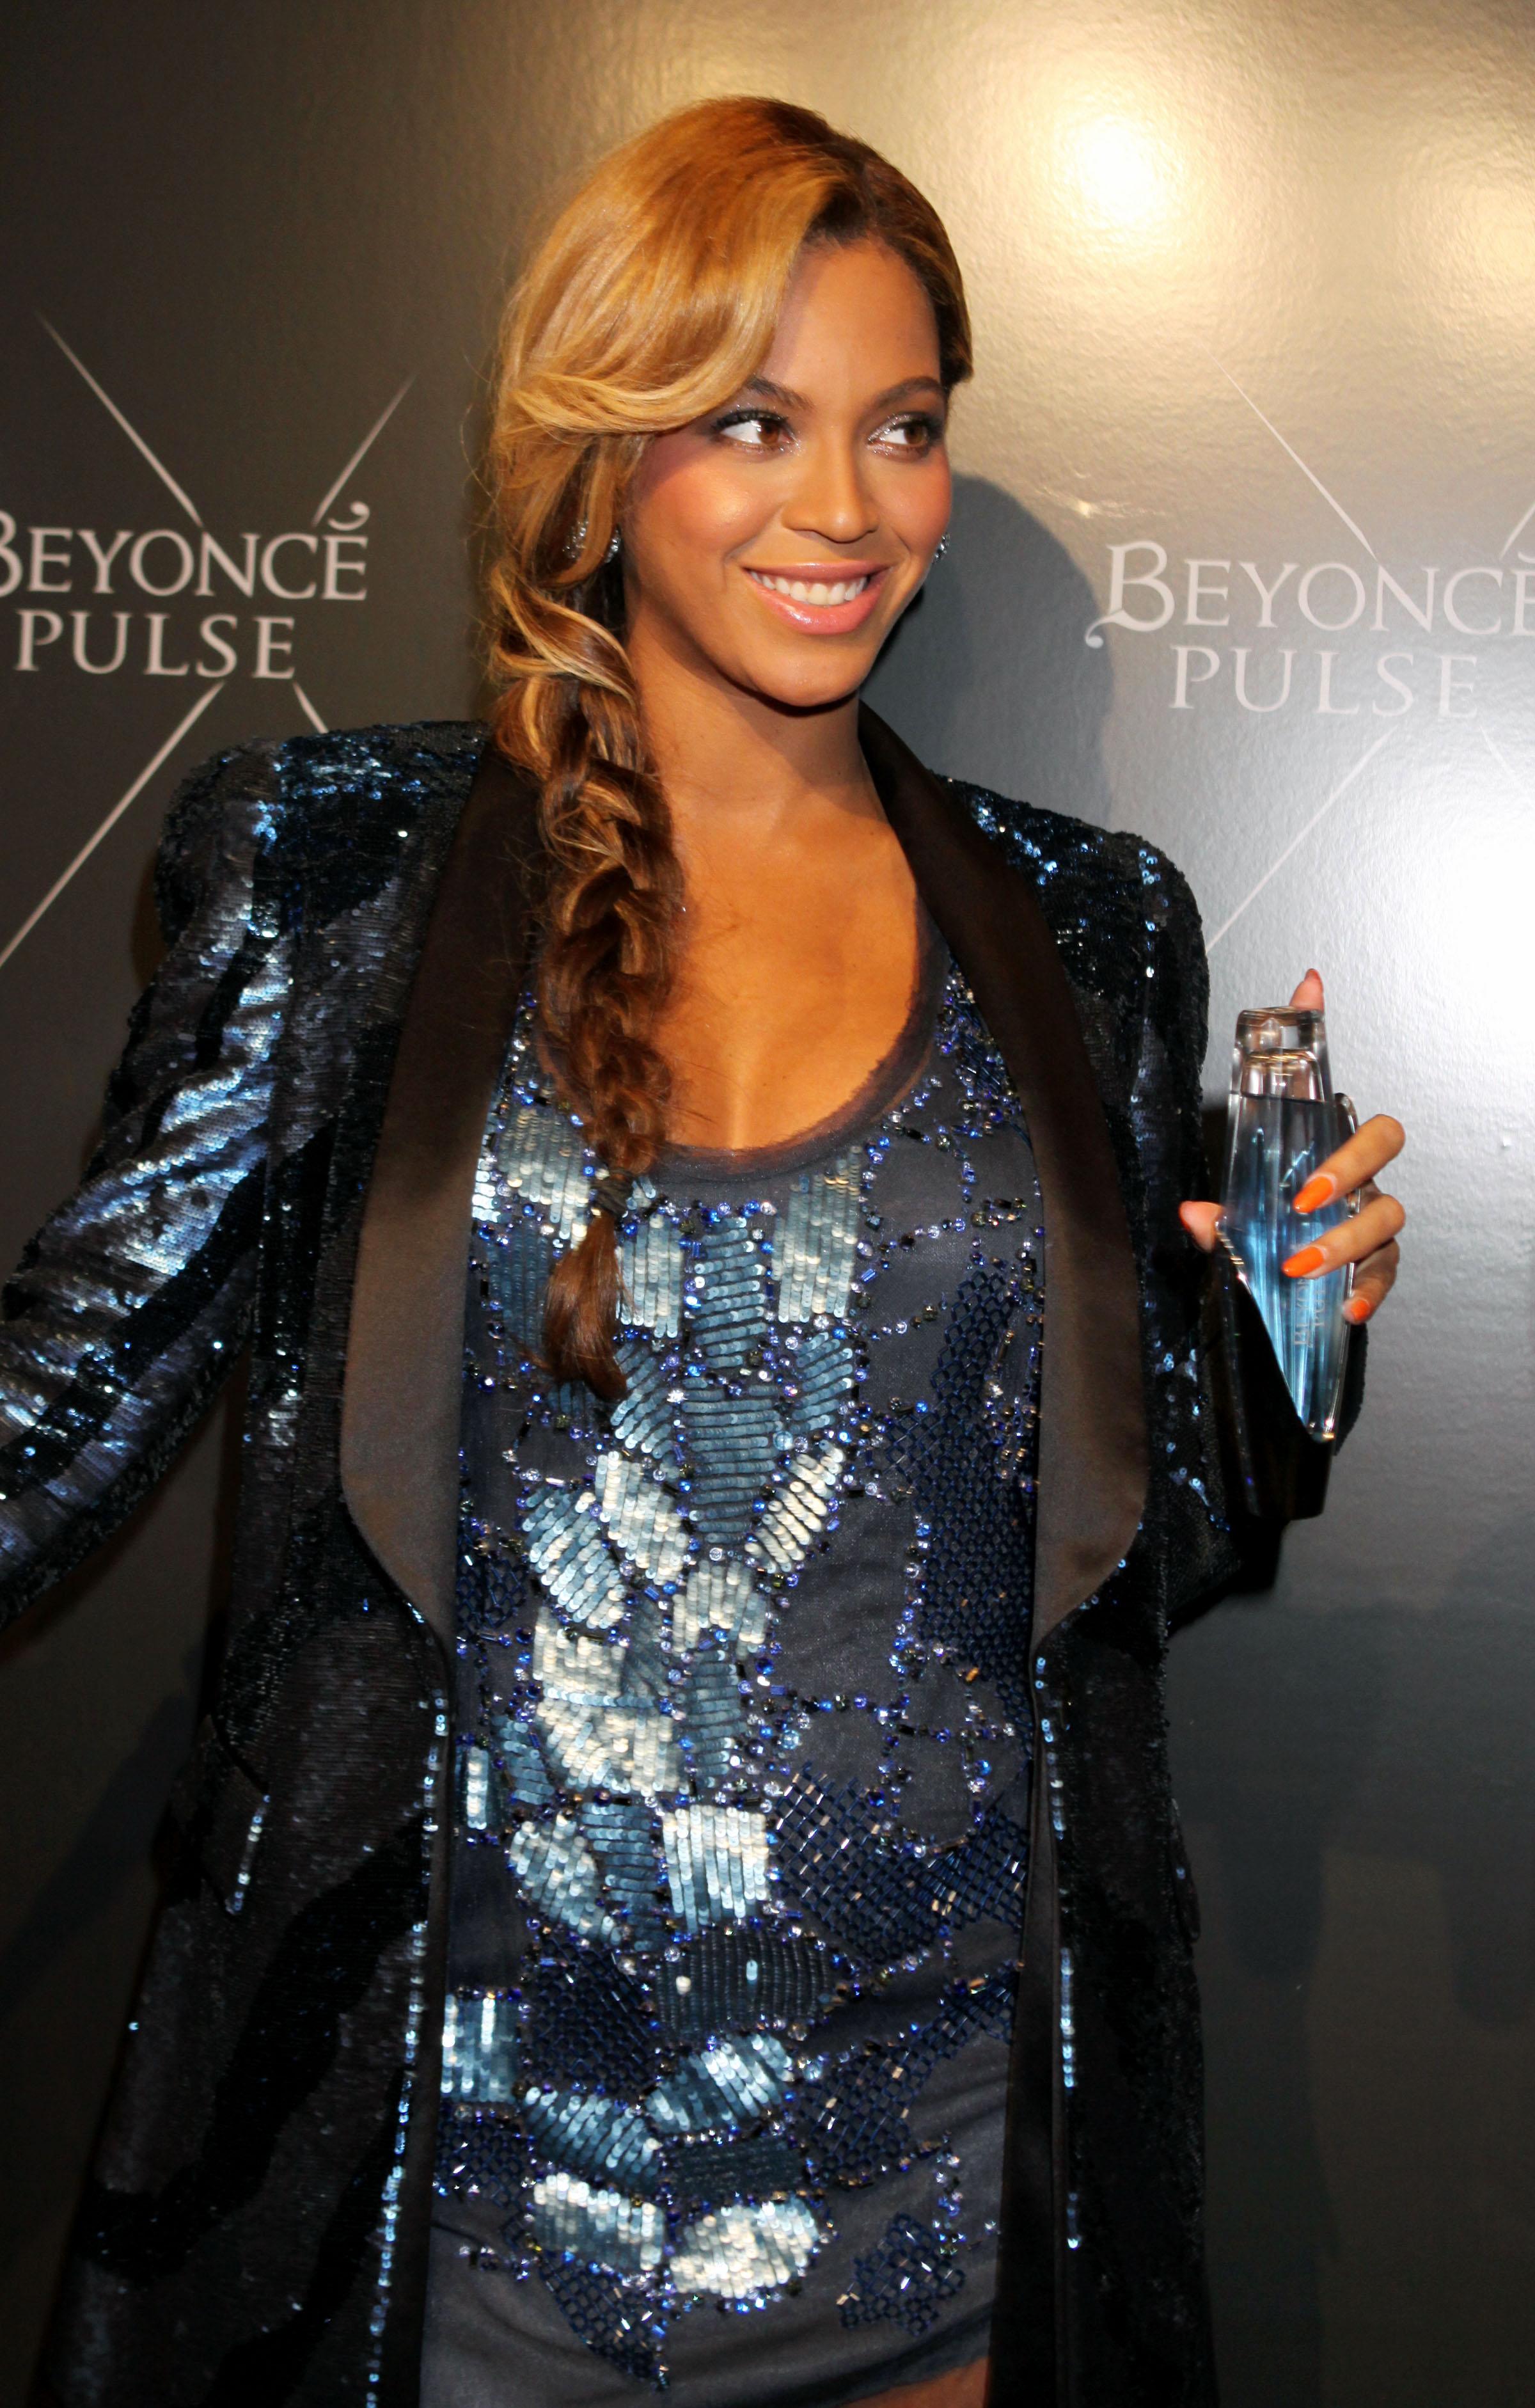 FP 7916534 Beyonce Pulse NYC 09 24